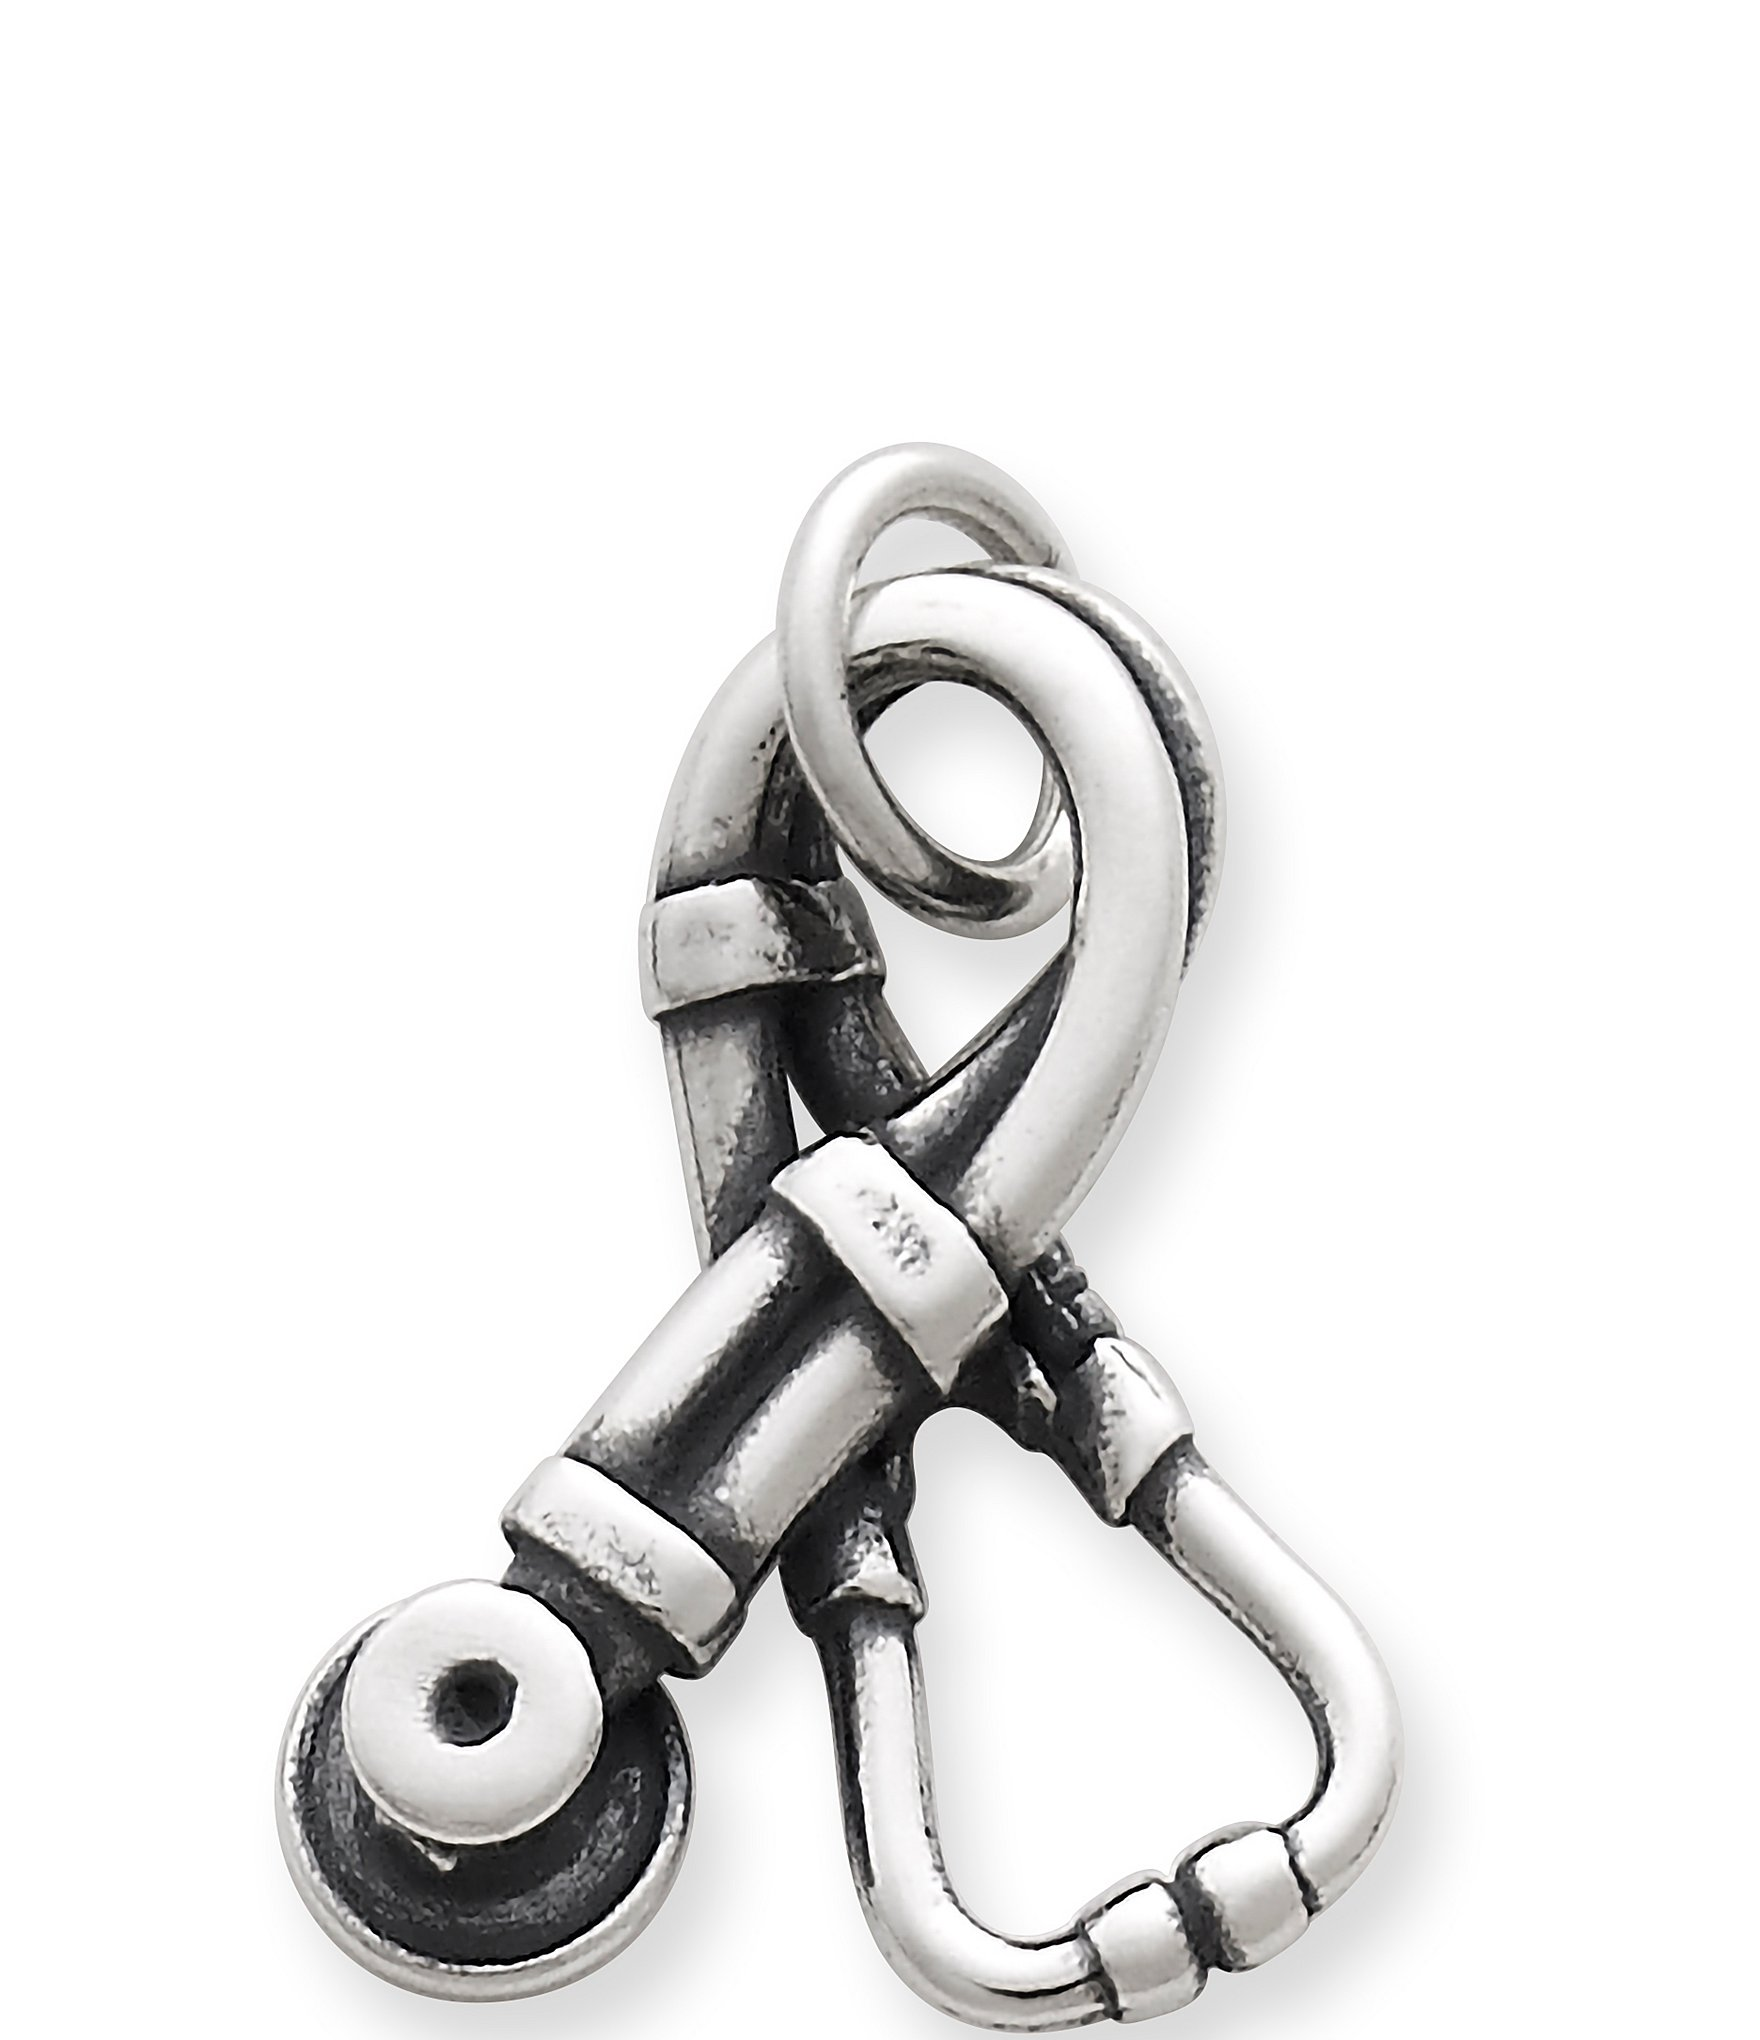 James Avery Stethoscope Sterling Silver Charm Dillards